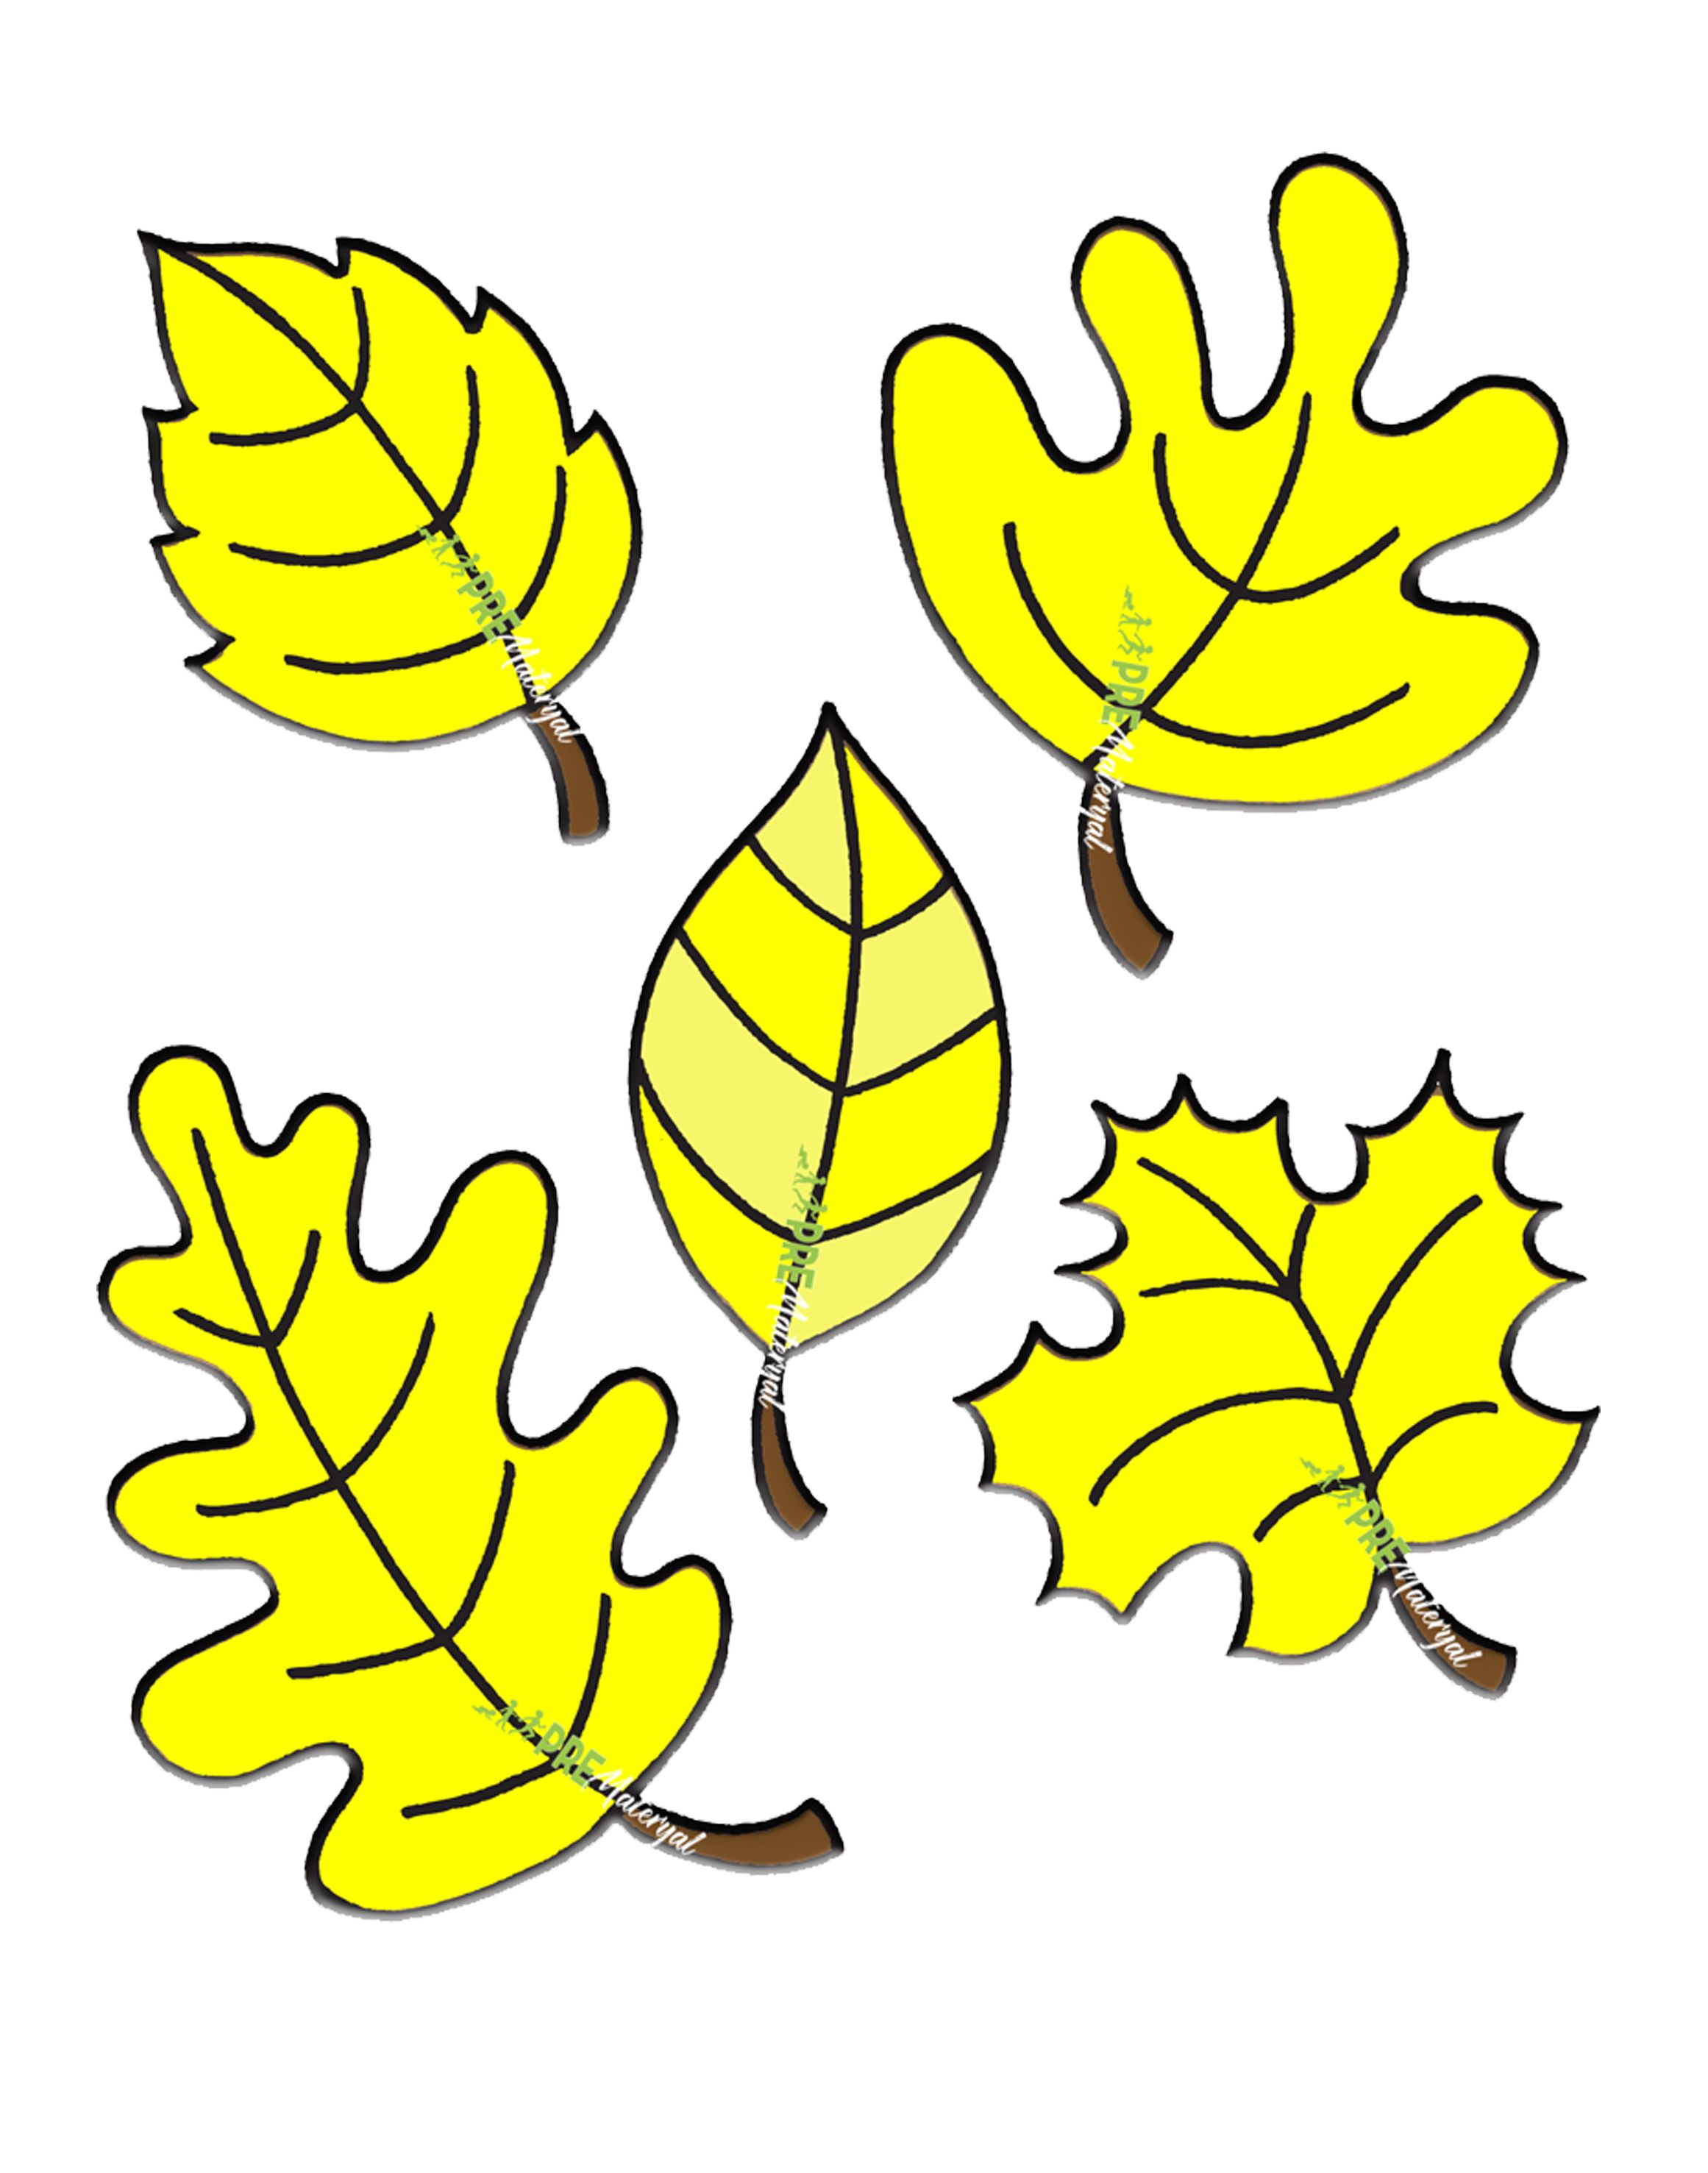 Renkli Yapraklar Premateryal Sonbahar Yapraklar Autumn Fall Leaf Disney Characters Character Pluto The Dog